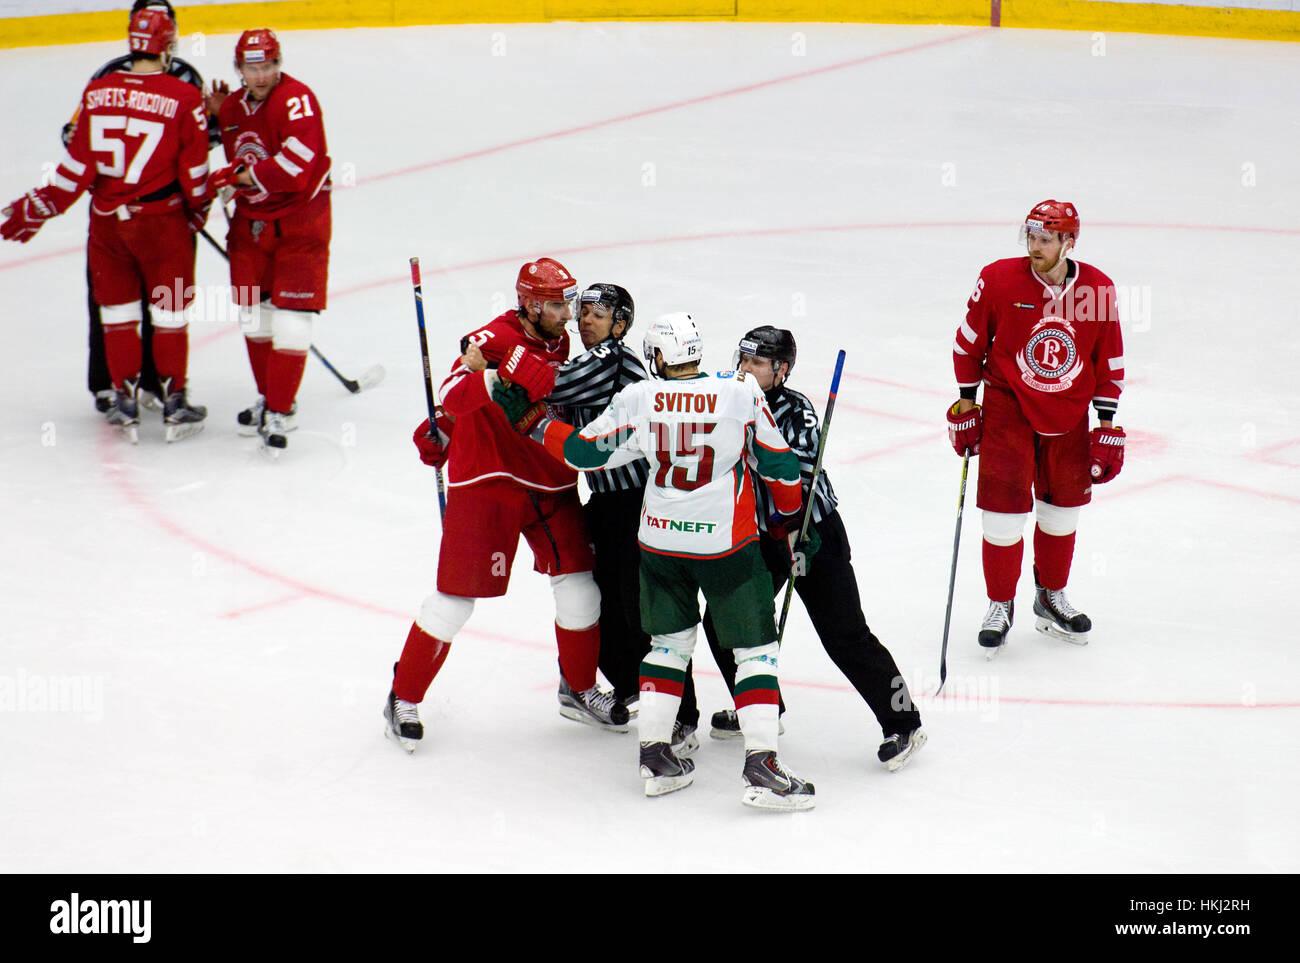 PODOLSK, Russland - 14. Januar 2017: A. Svitov (15) und A. Semenov (5) kämpfen auf Eishockey Spiel Witjas Vs AKBars Stockfoto